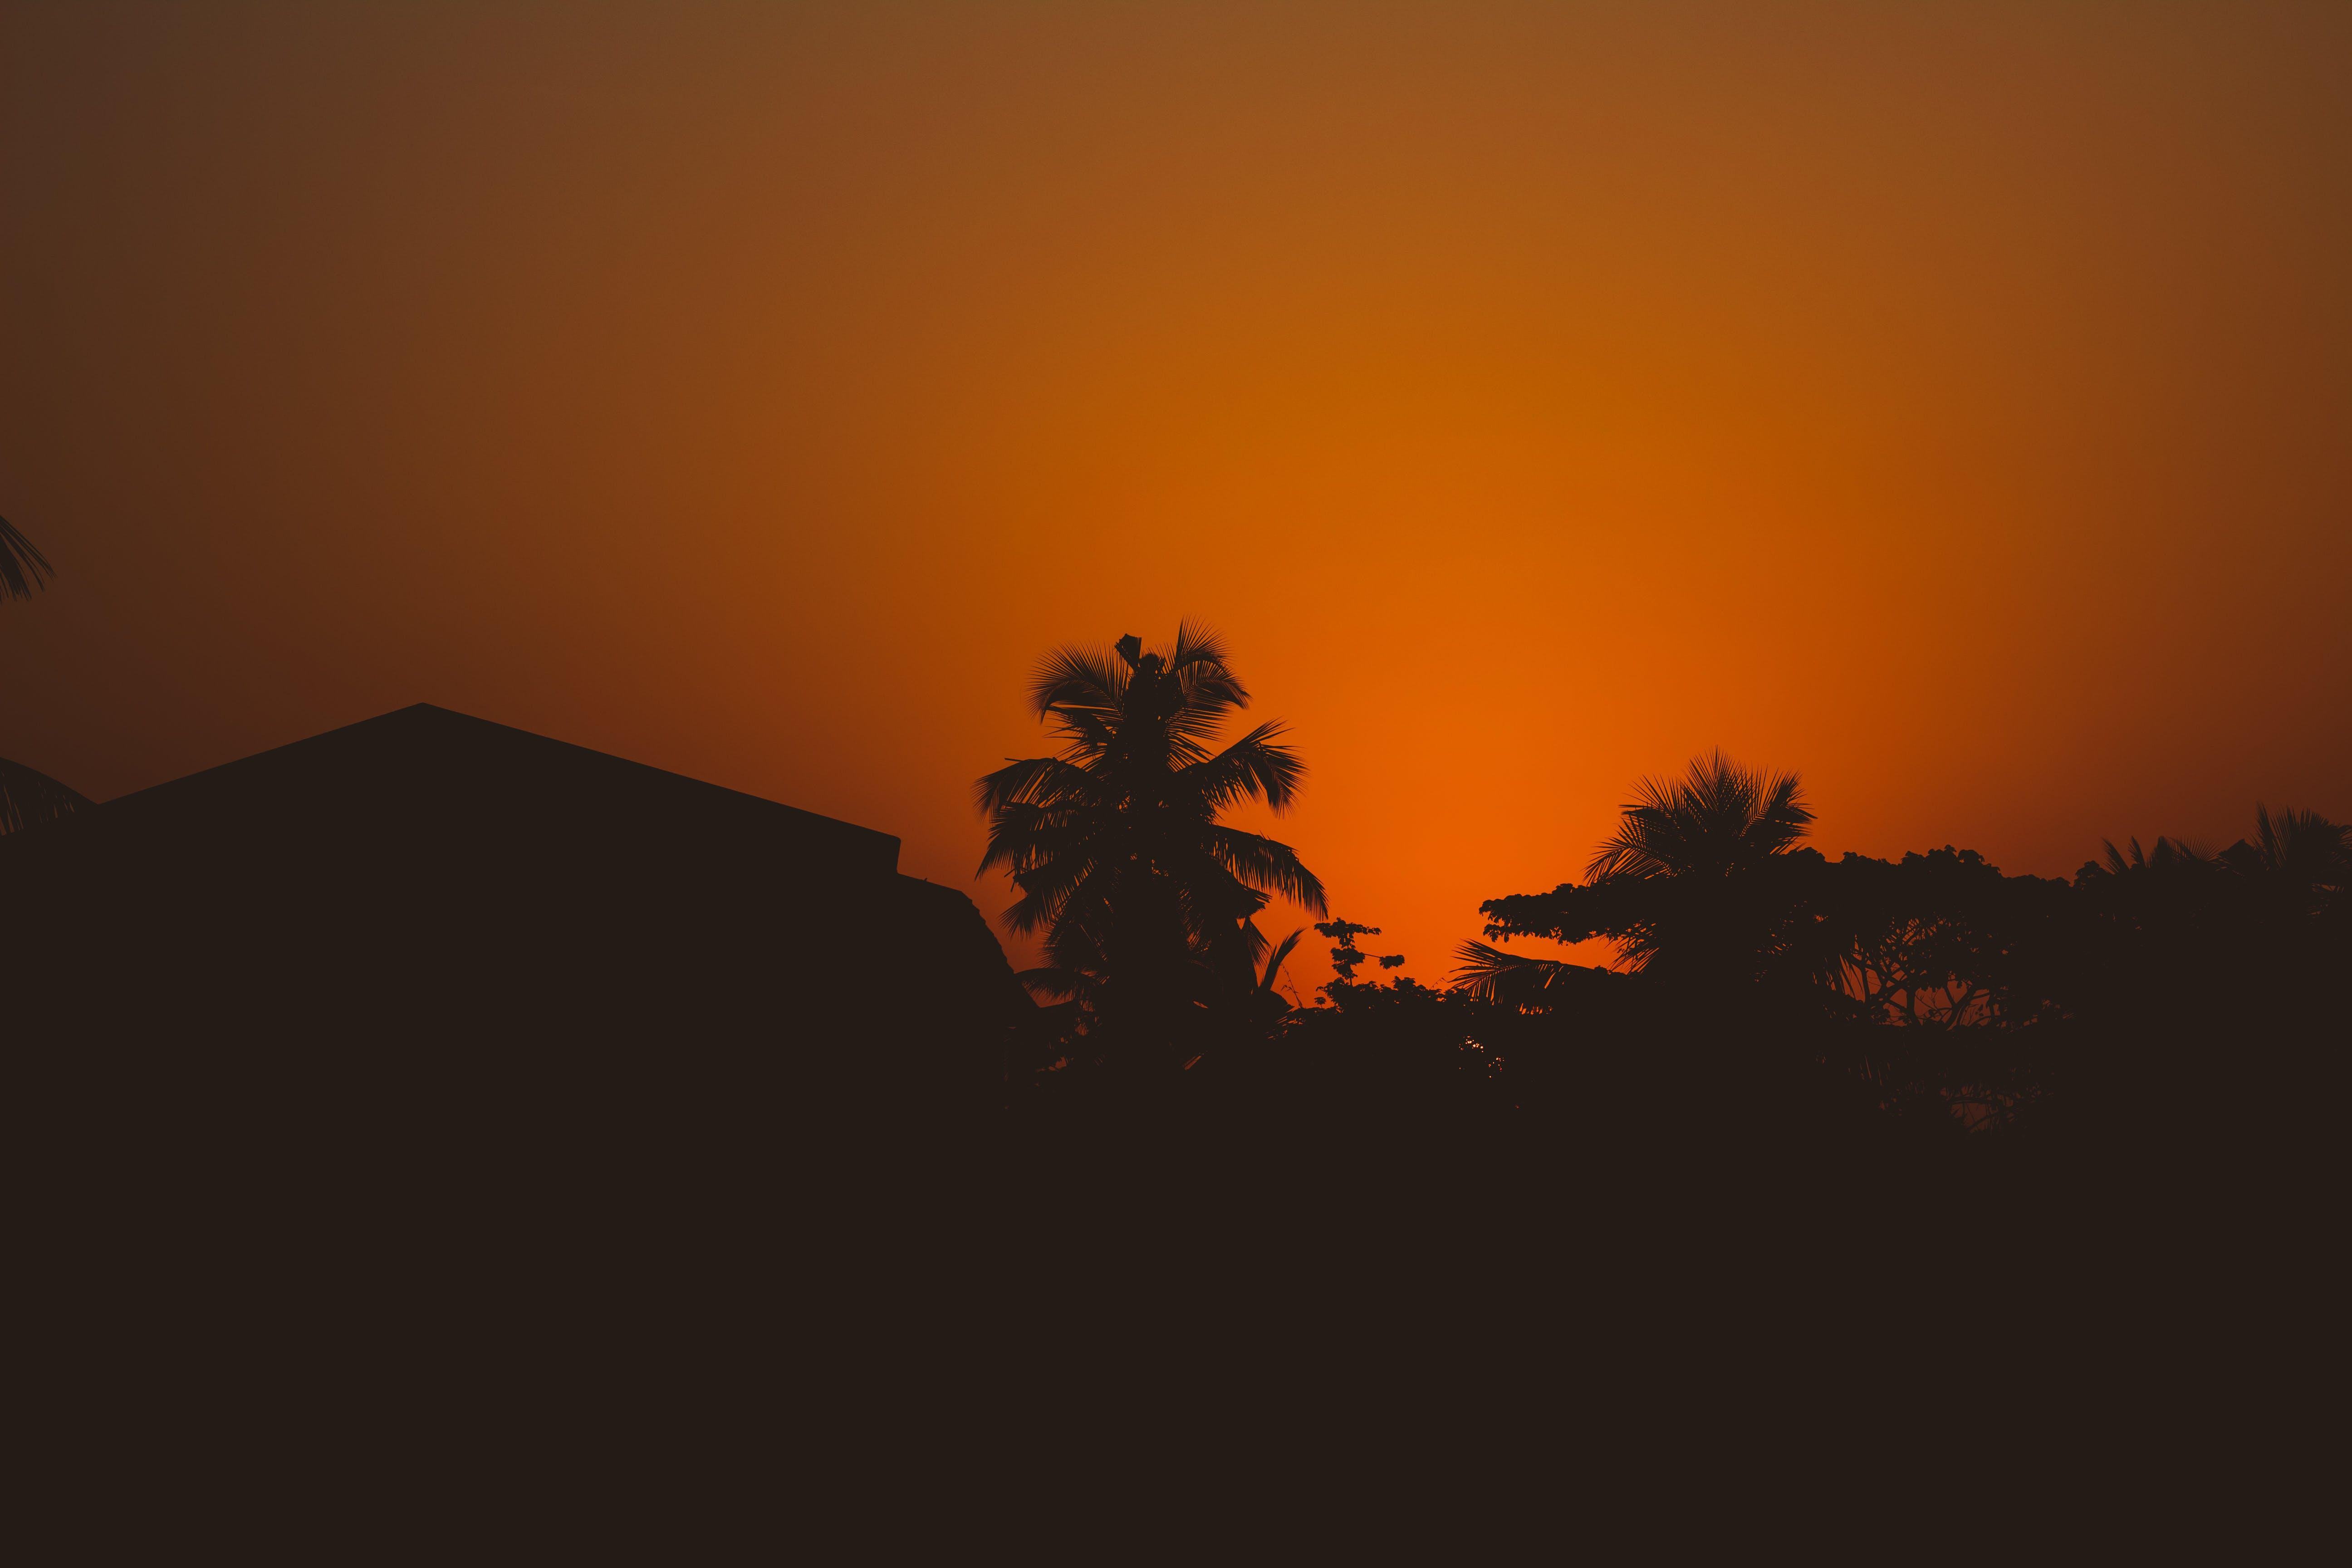 Kostenloses Stock Foto zu dämmerung, sonnenuntergang, sonnenaufgang, silhouette